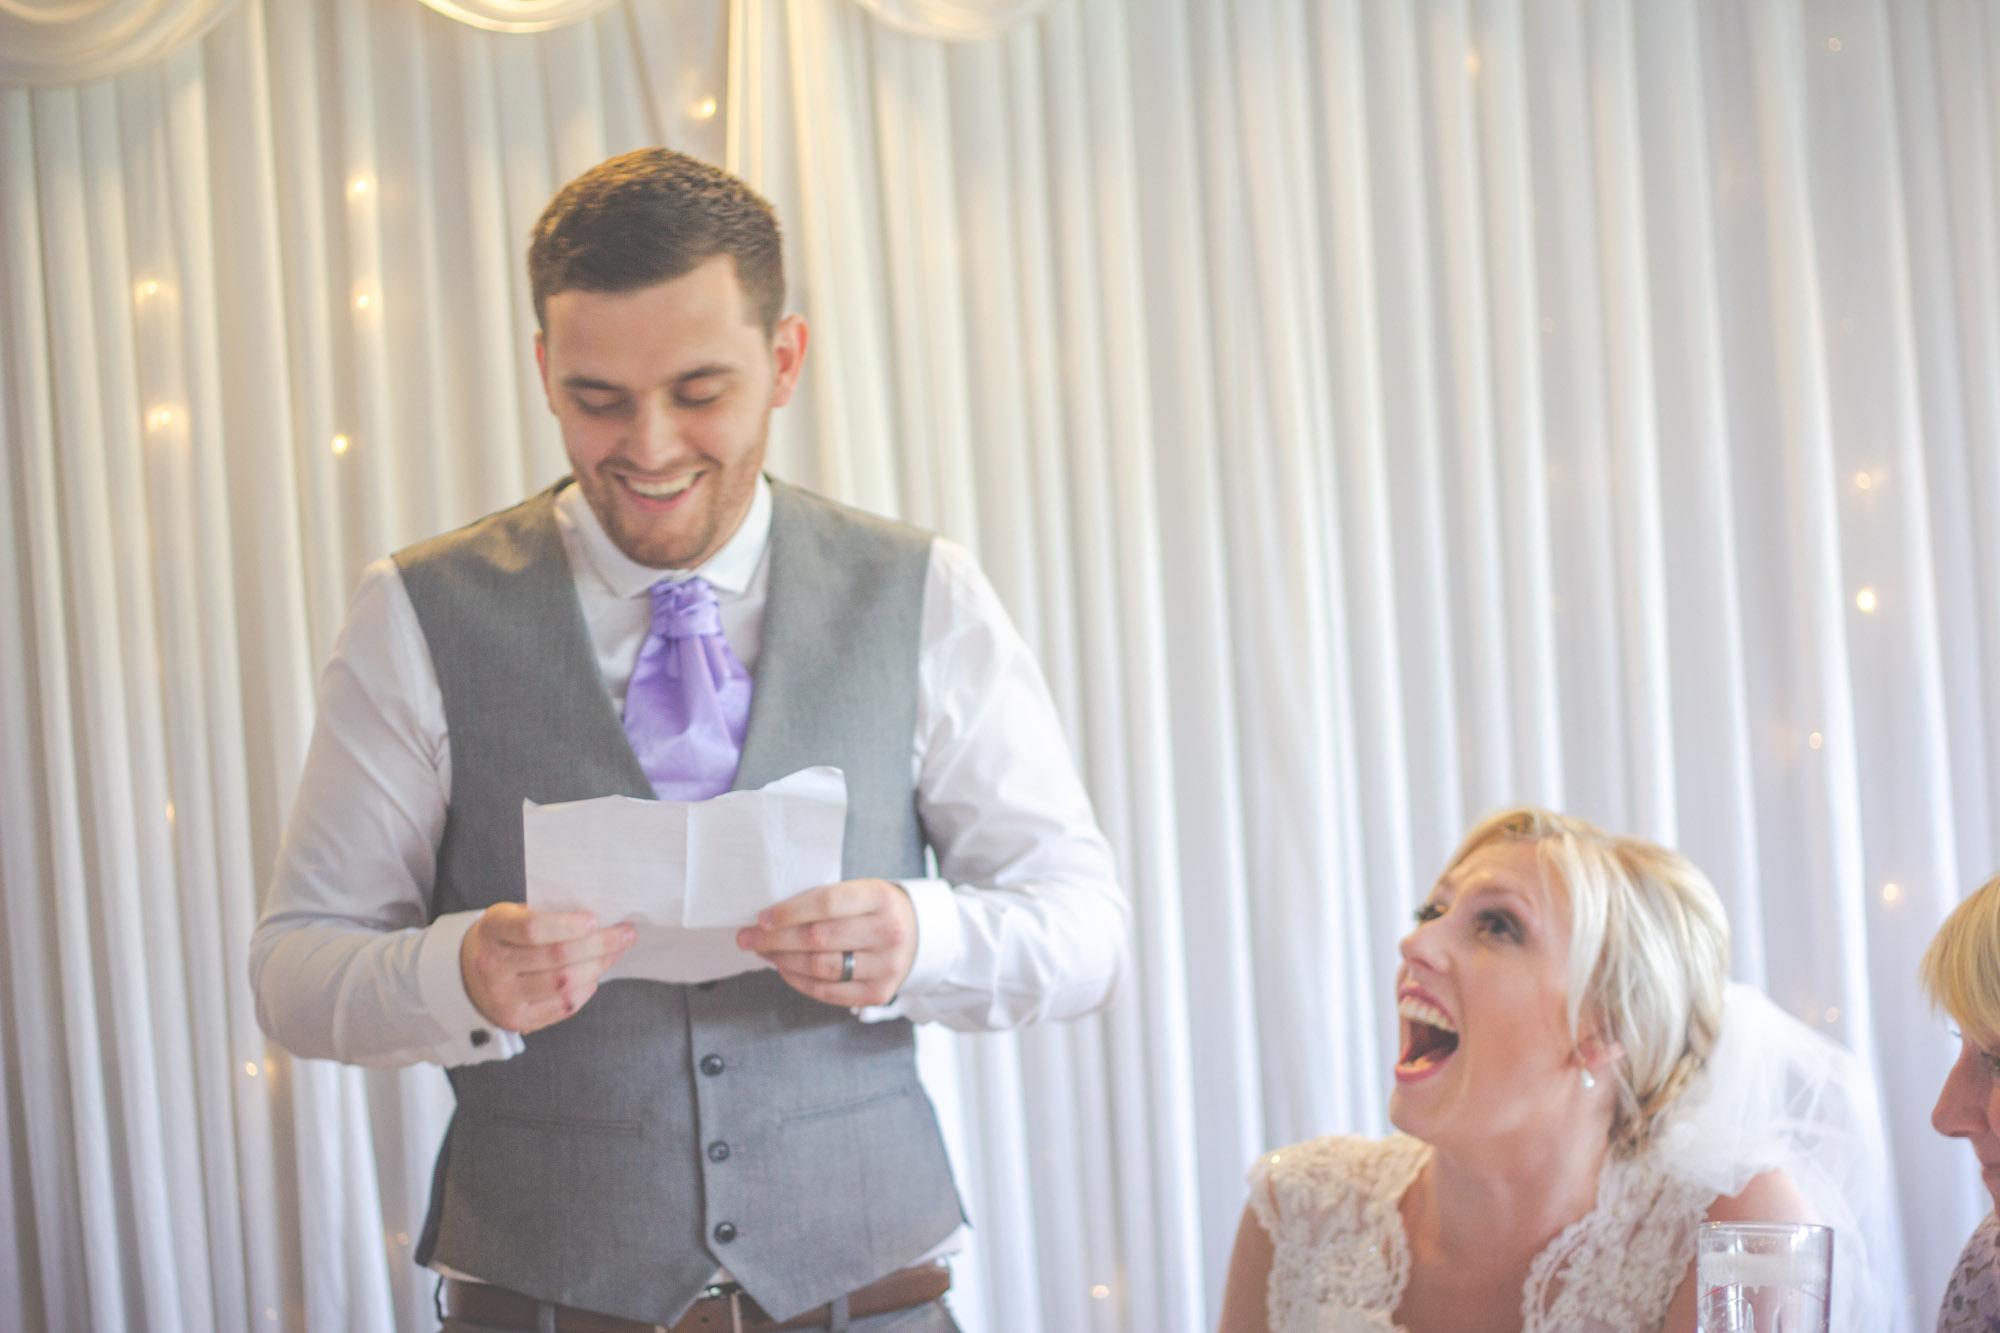 skipton-registry-office-wedding-photography-50.jpg